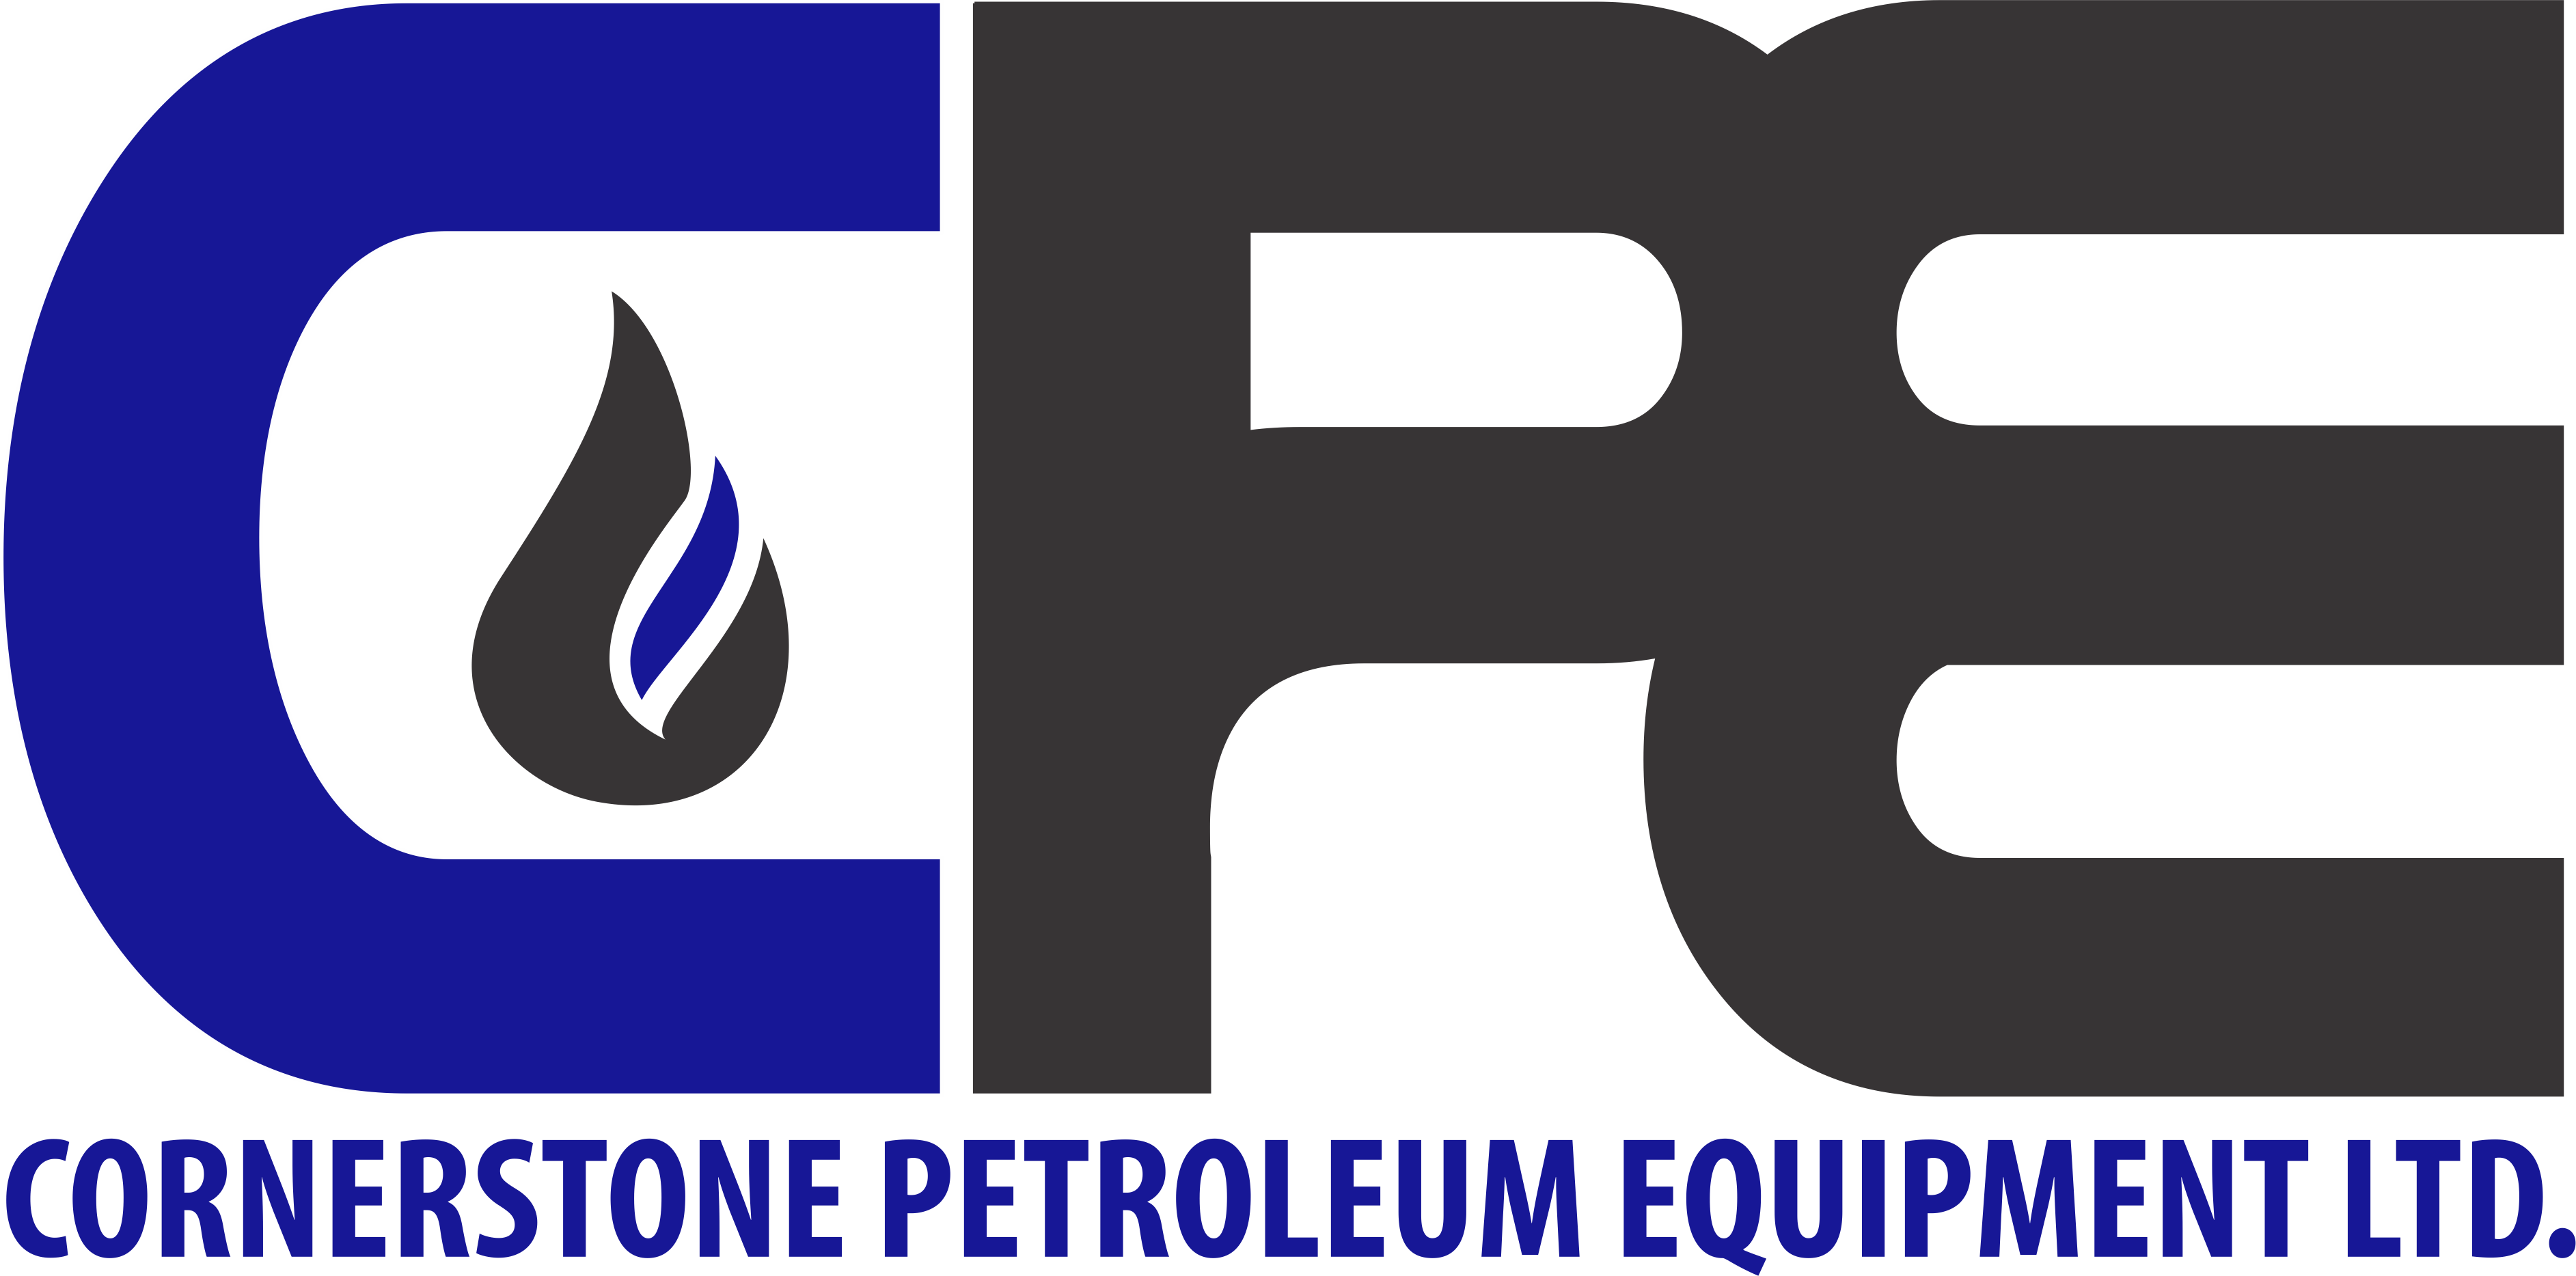 Cornerstone Petroleum